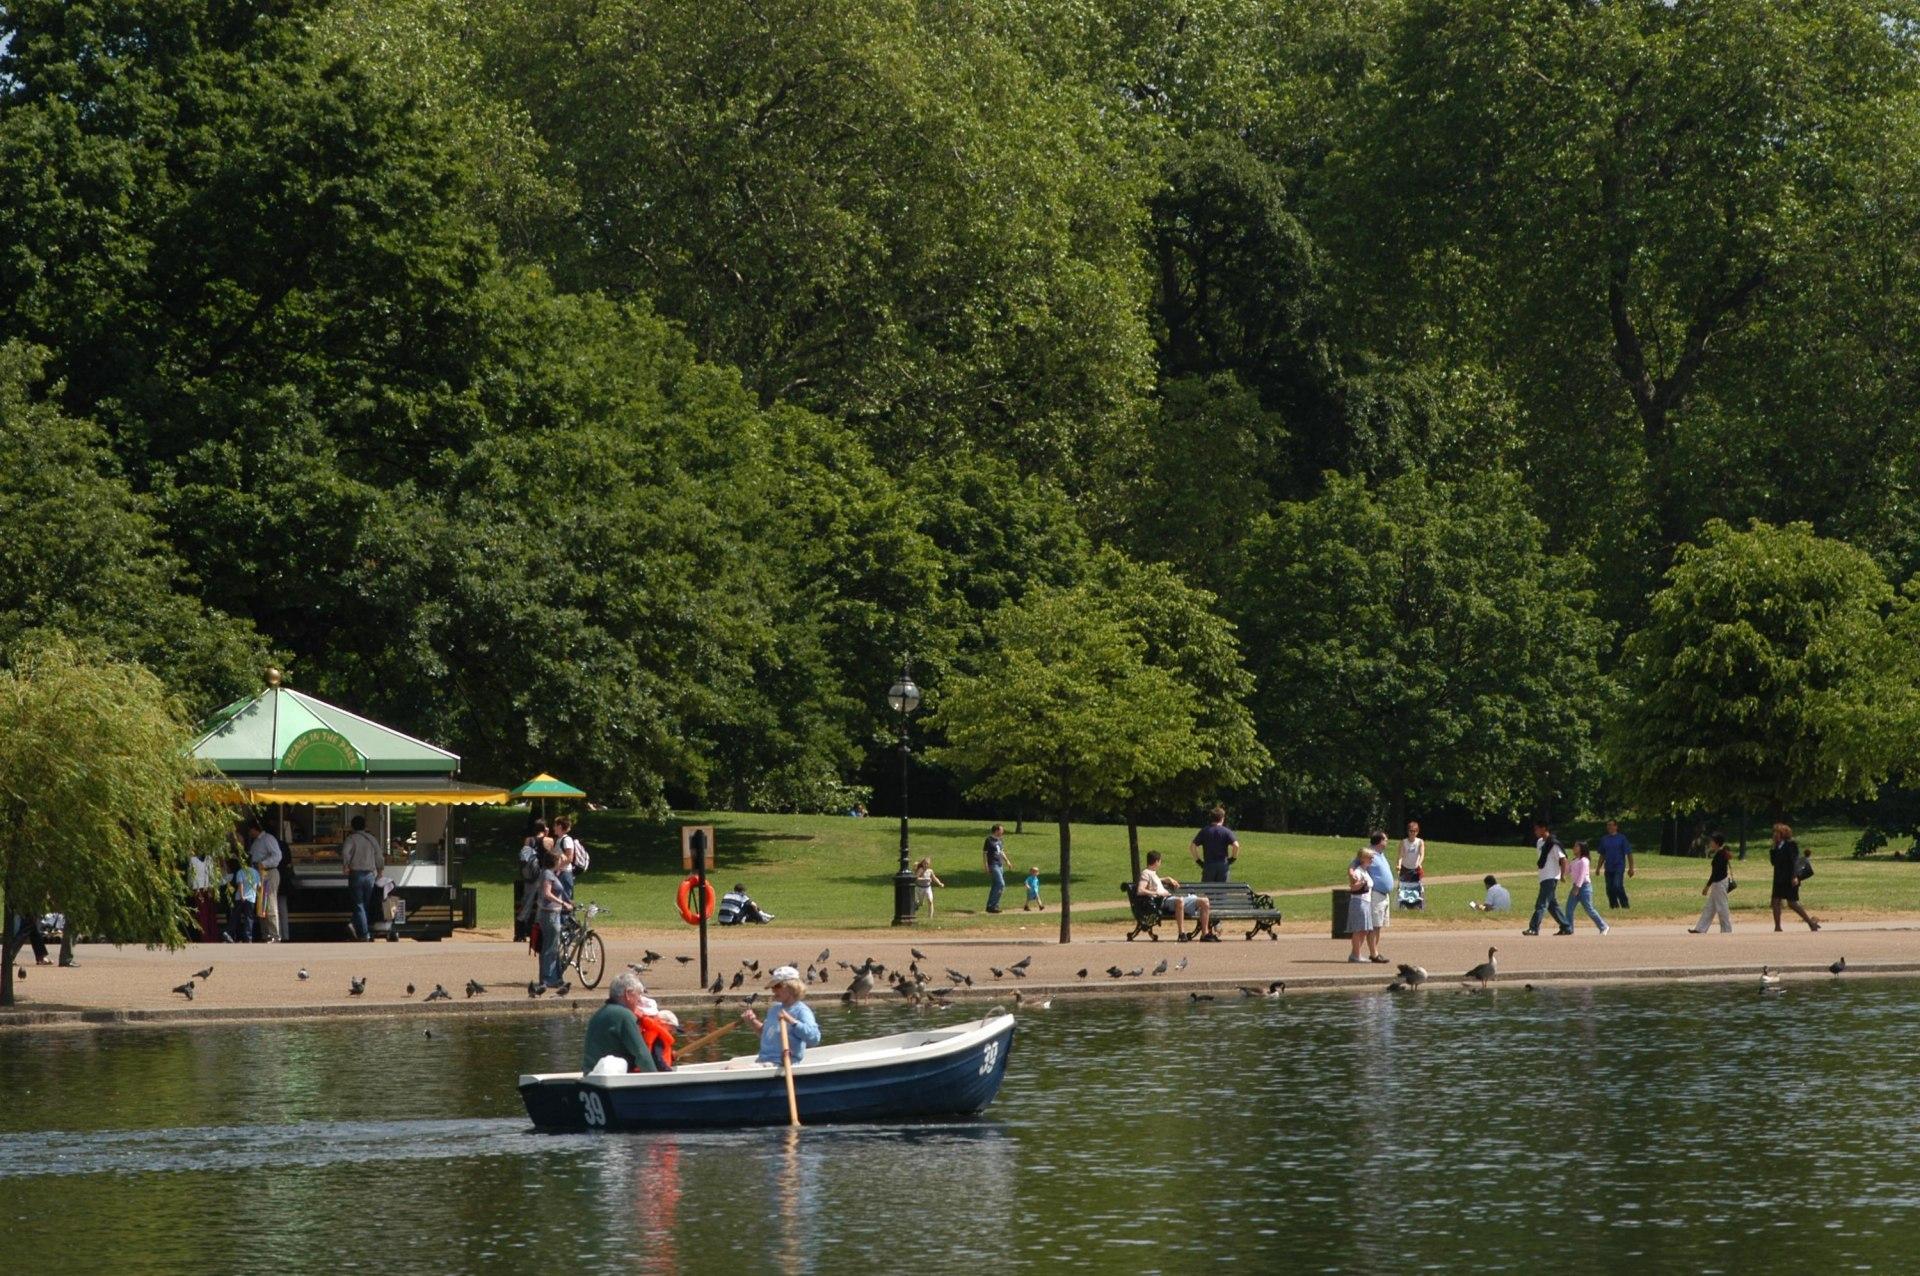 Hyde Park Boating Lake© Andy Lane